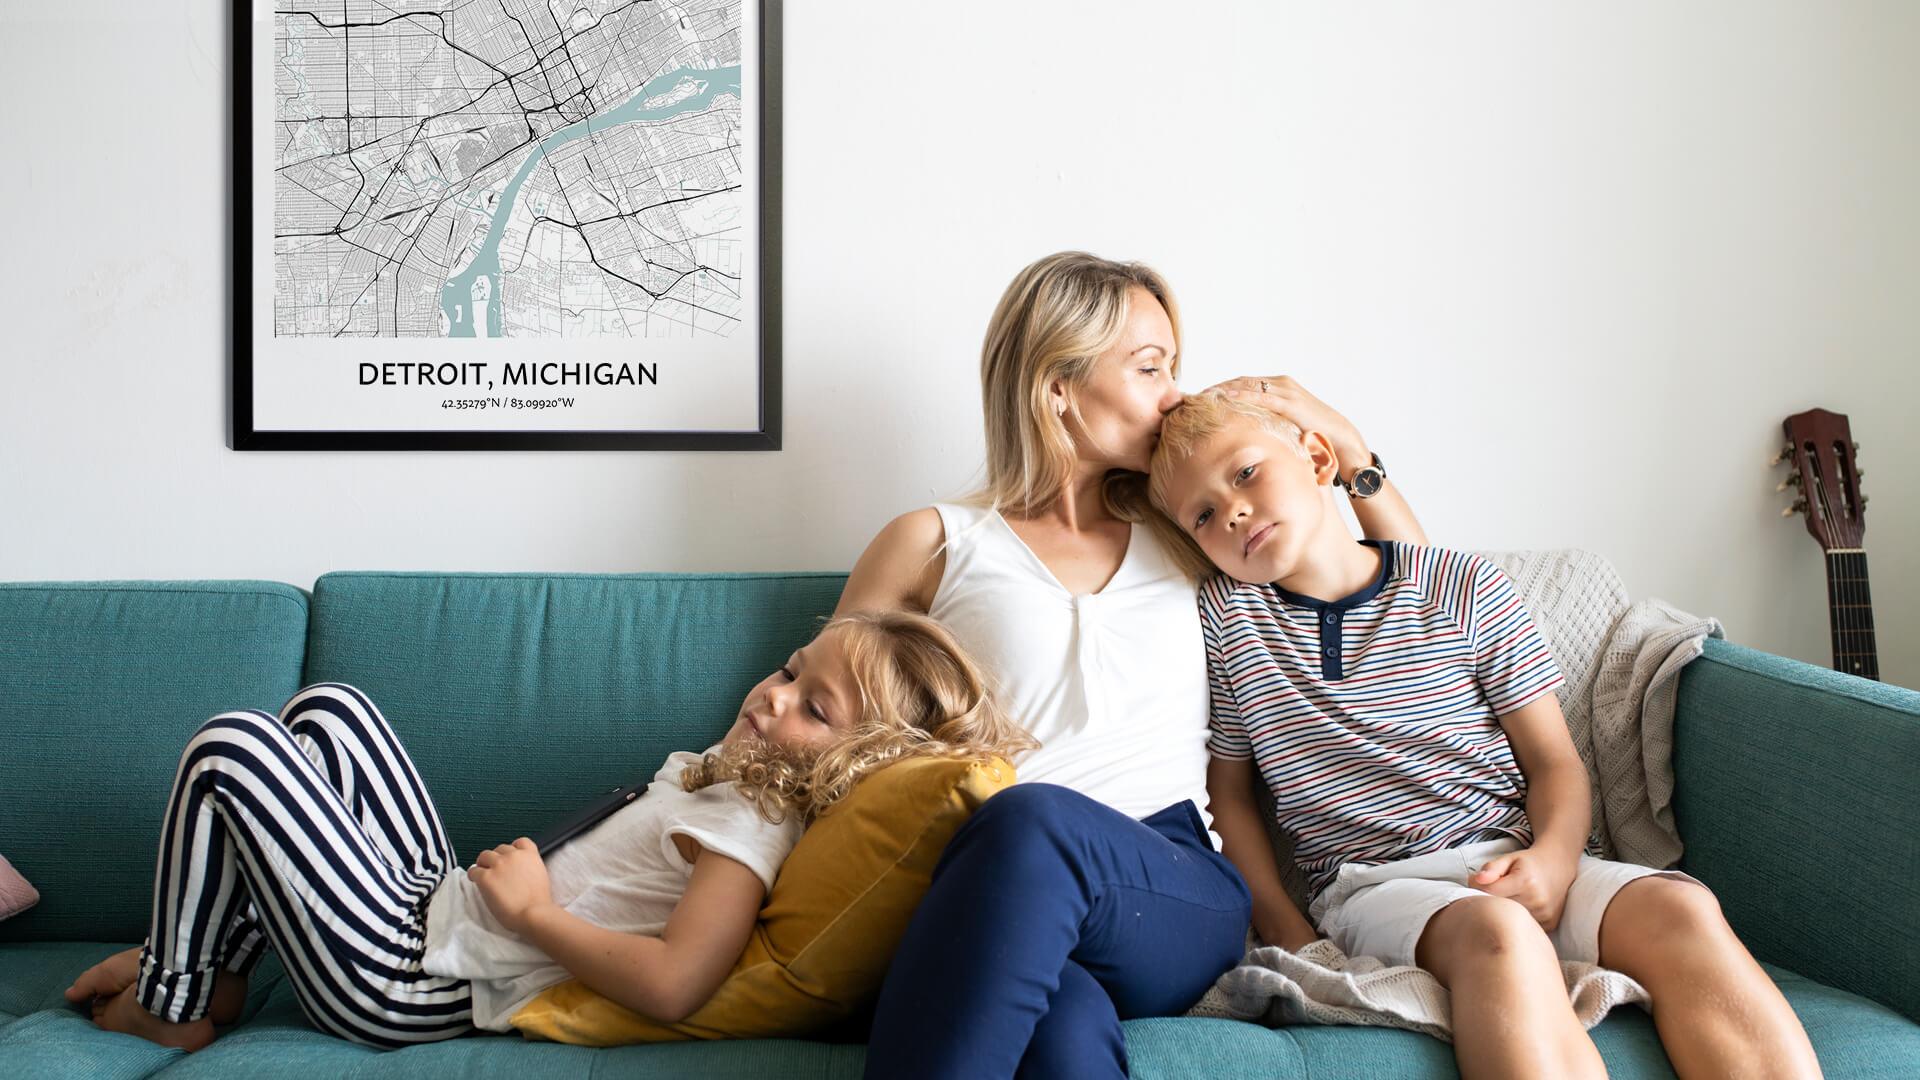 Detroit map poster